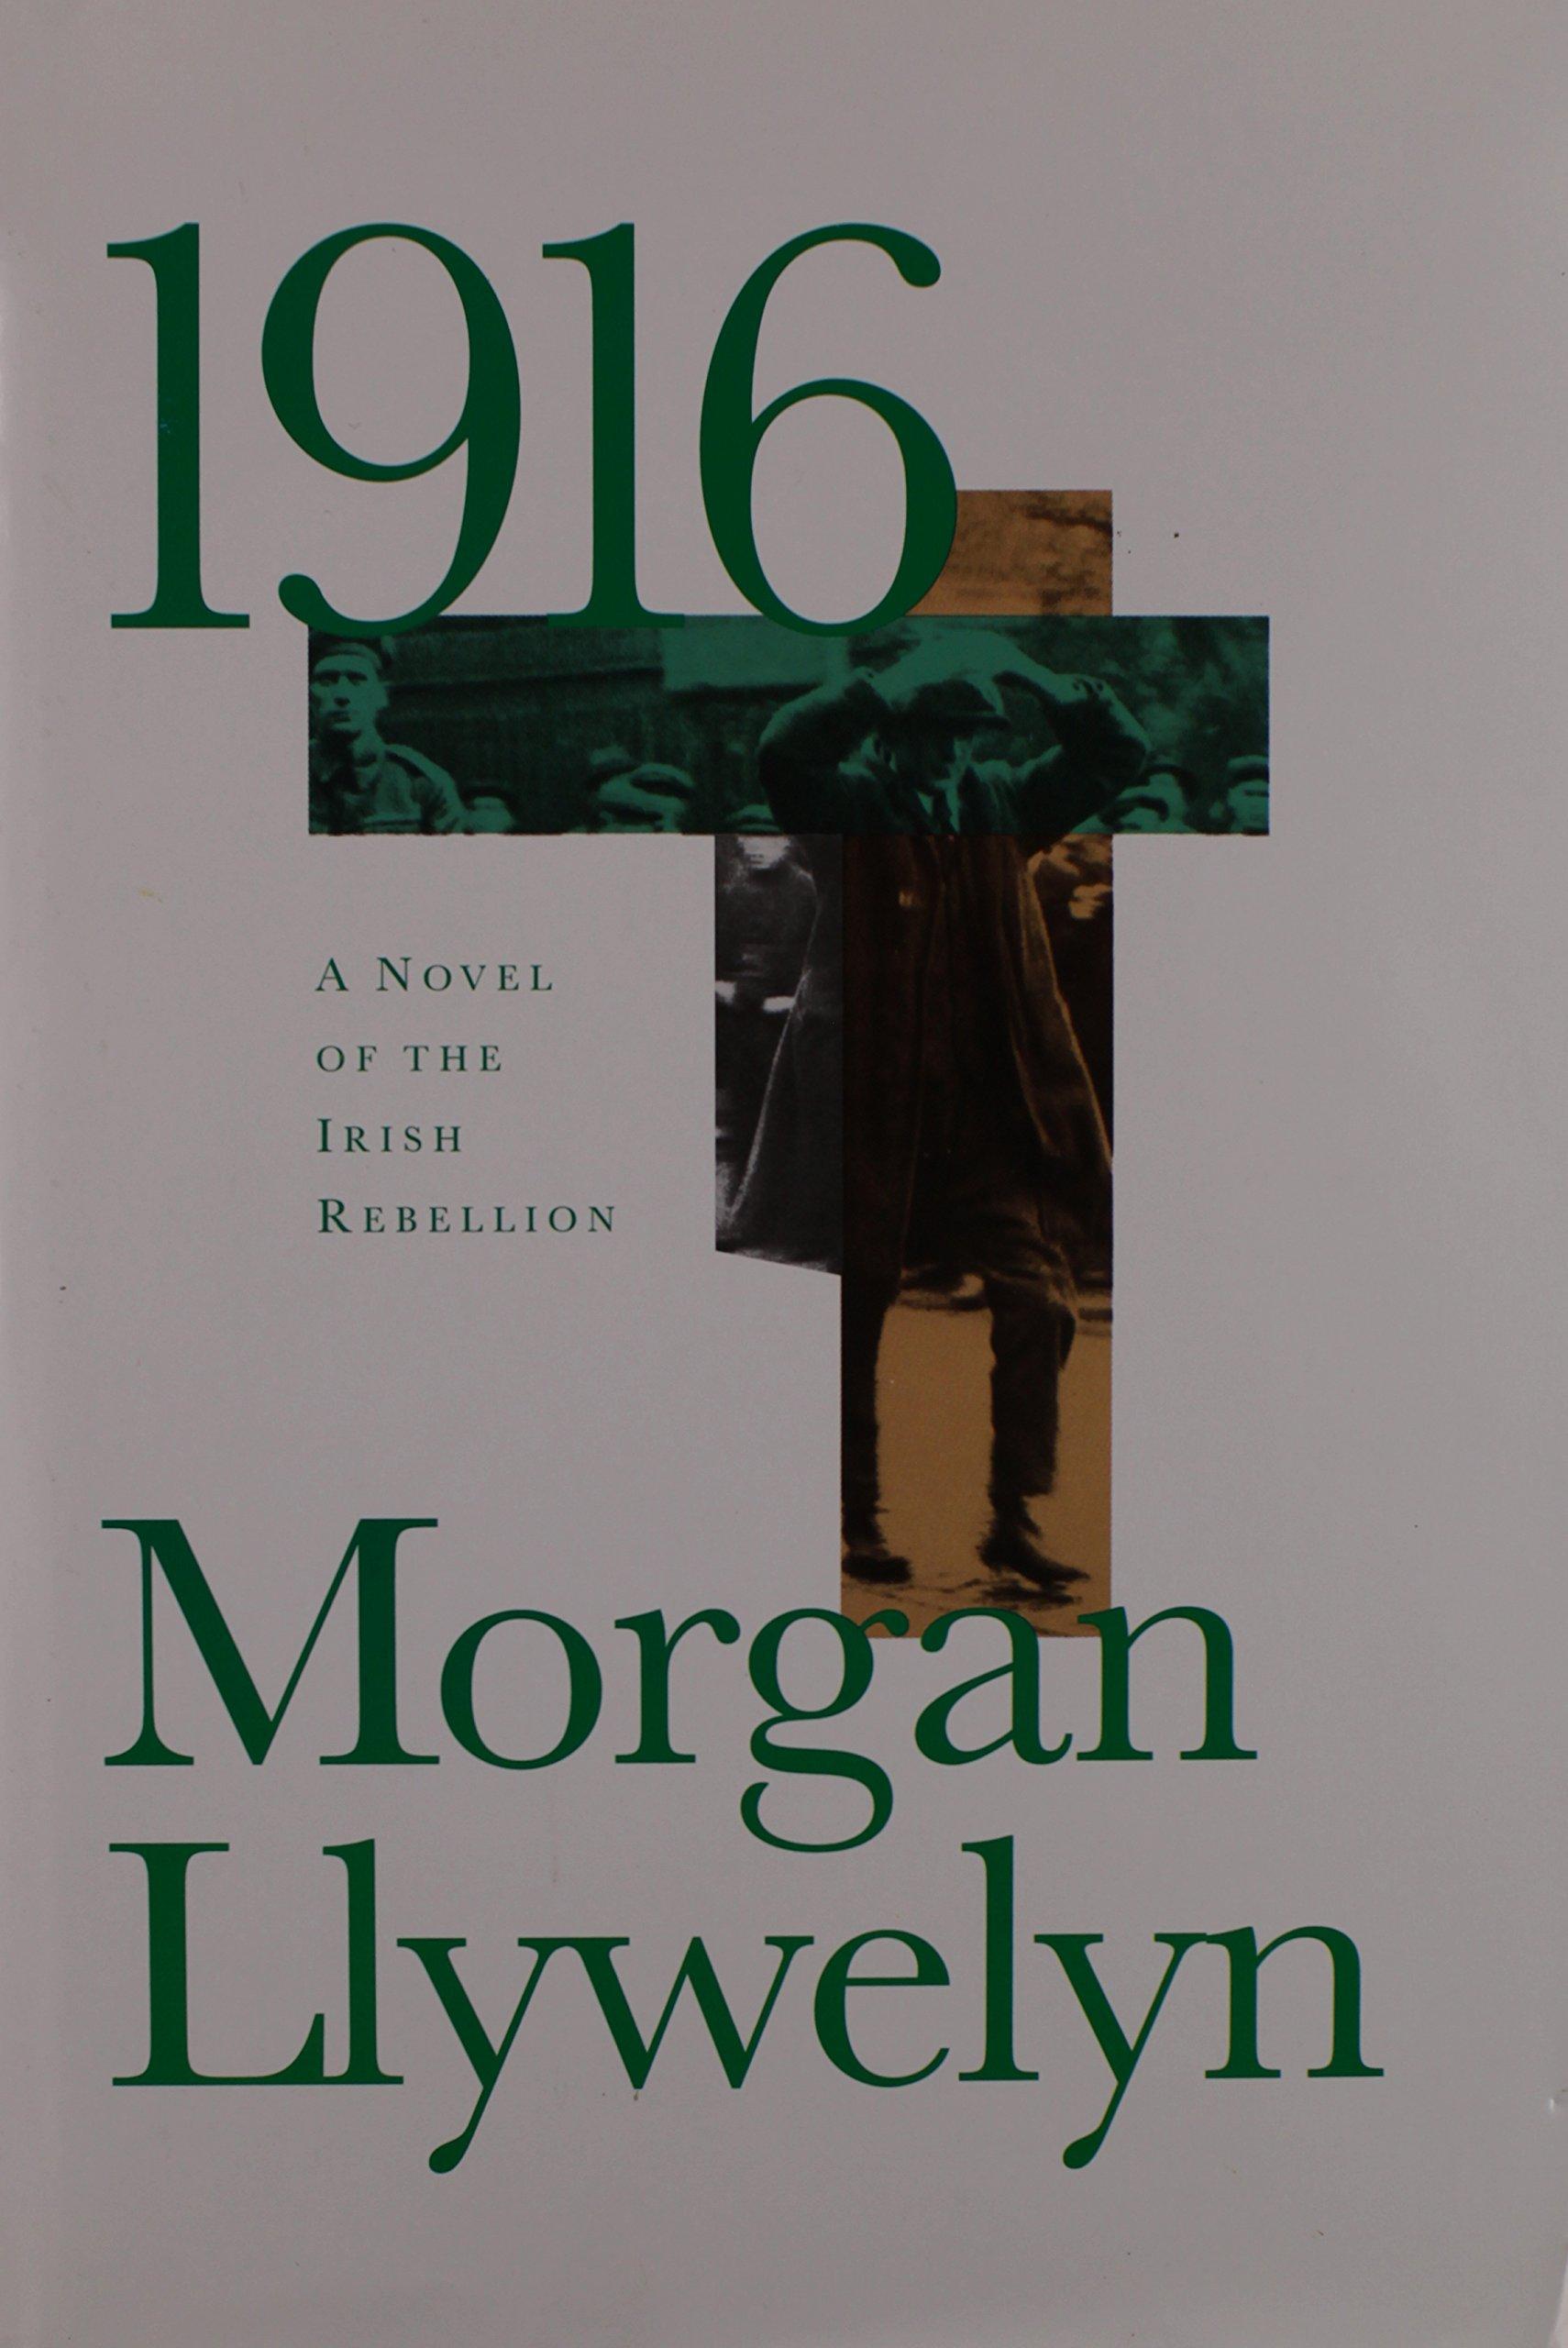 1916 : A Novel of the Irish Rebellion: Morgan Llywelyn: 9781568658353:  Amazon.com: Books